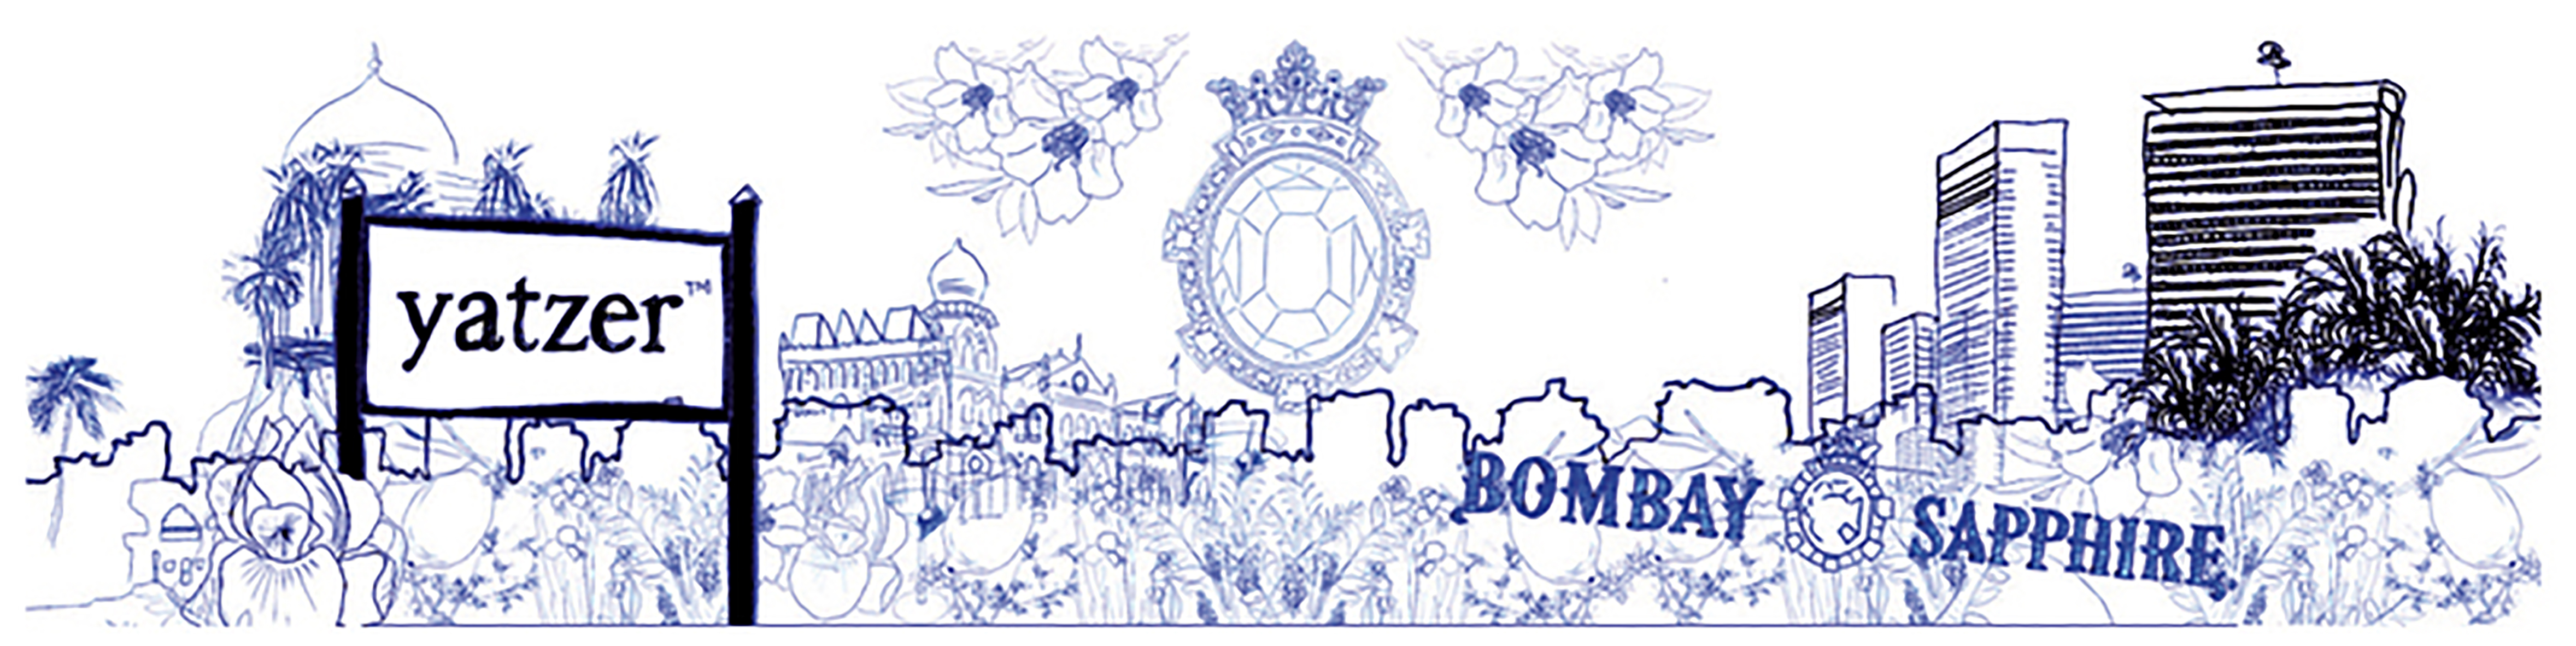 Yatzer - Bombay Sapphire